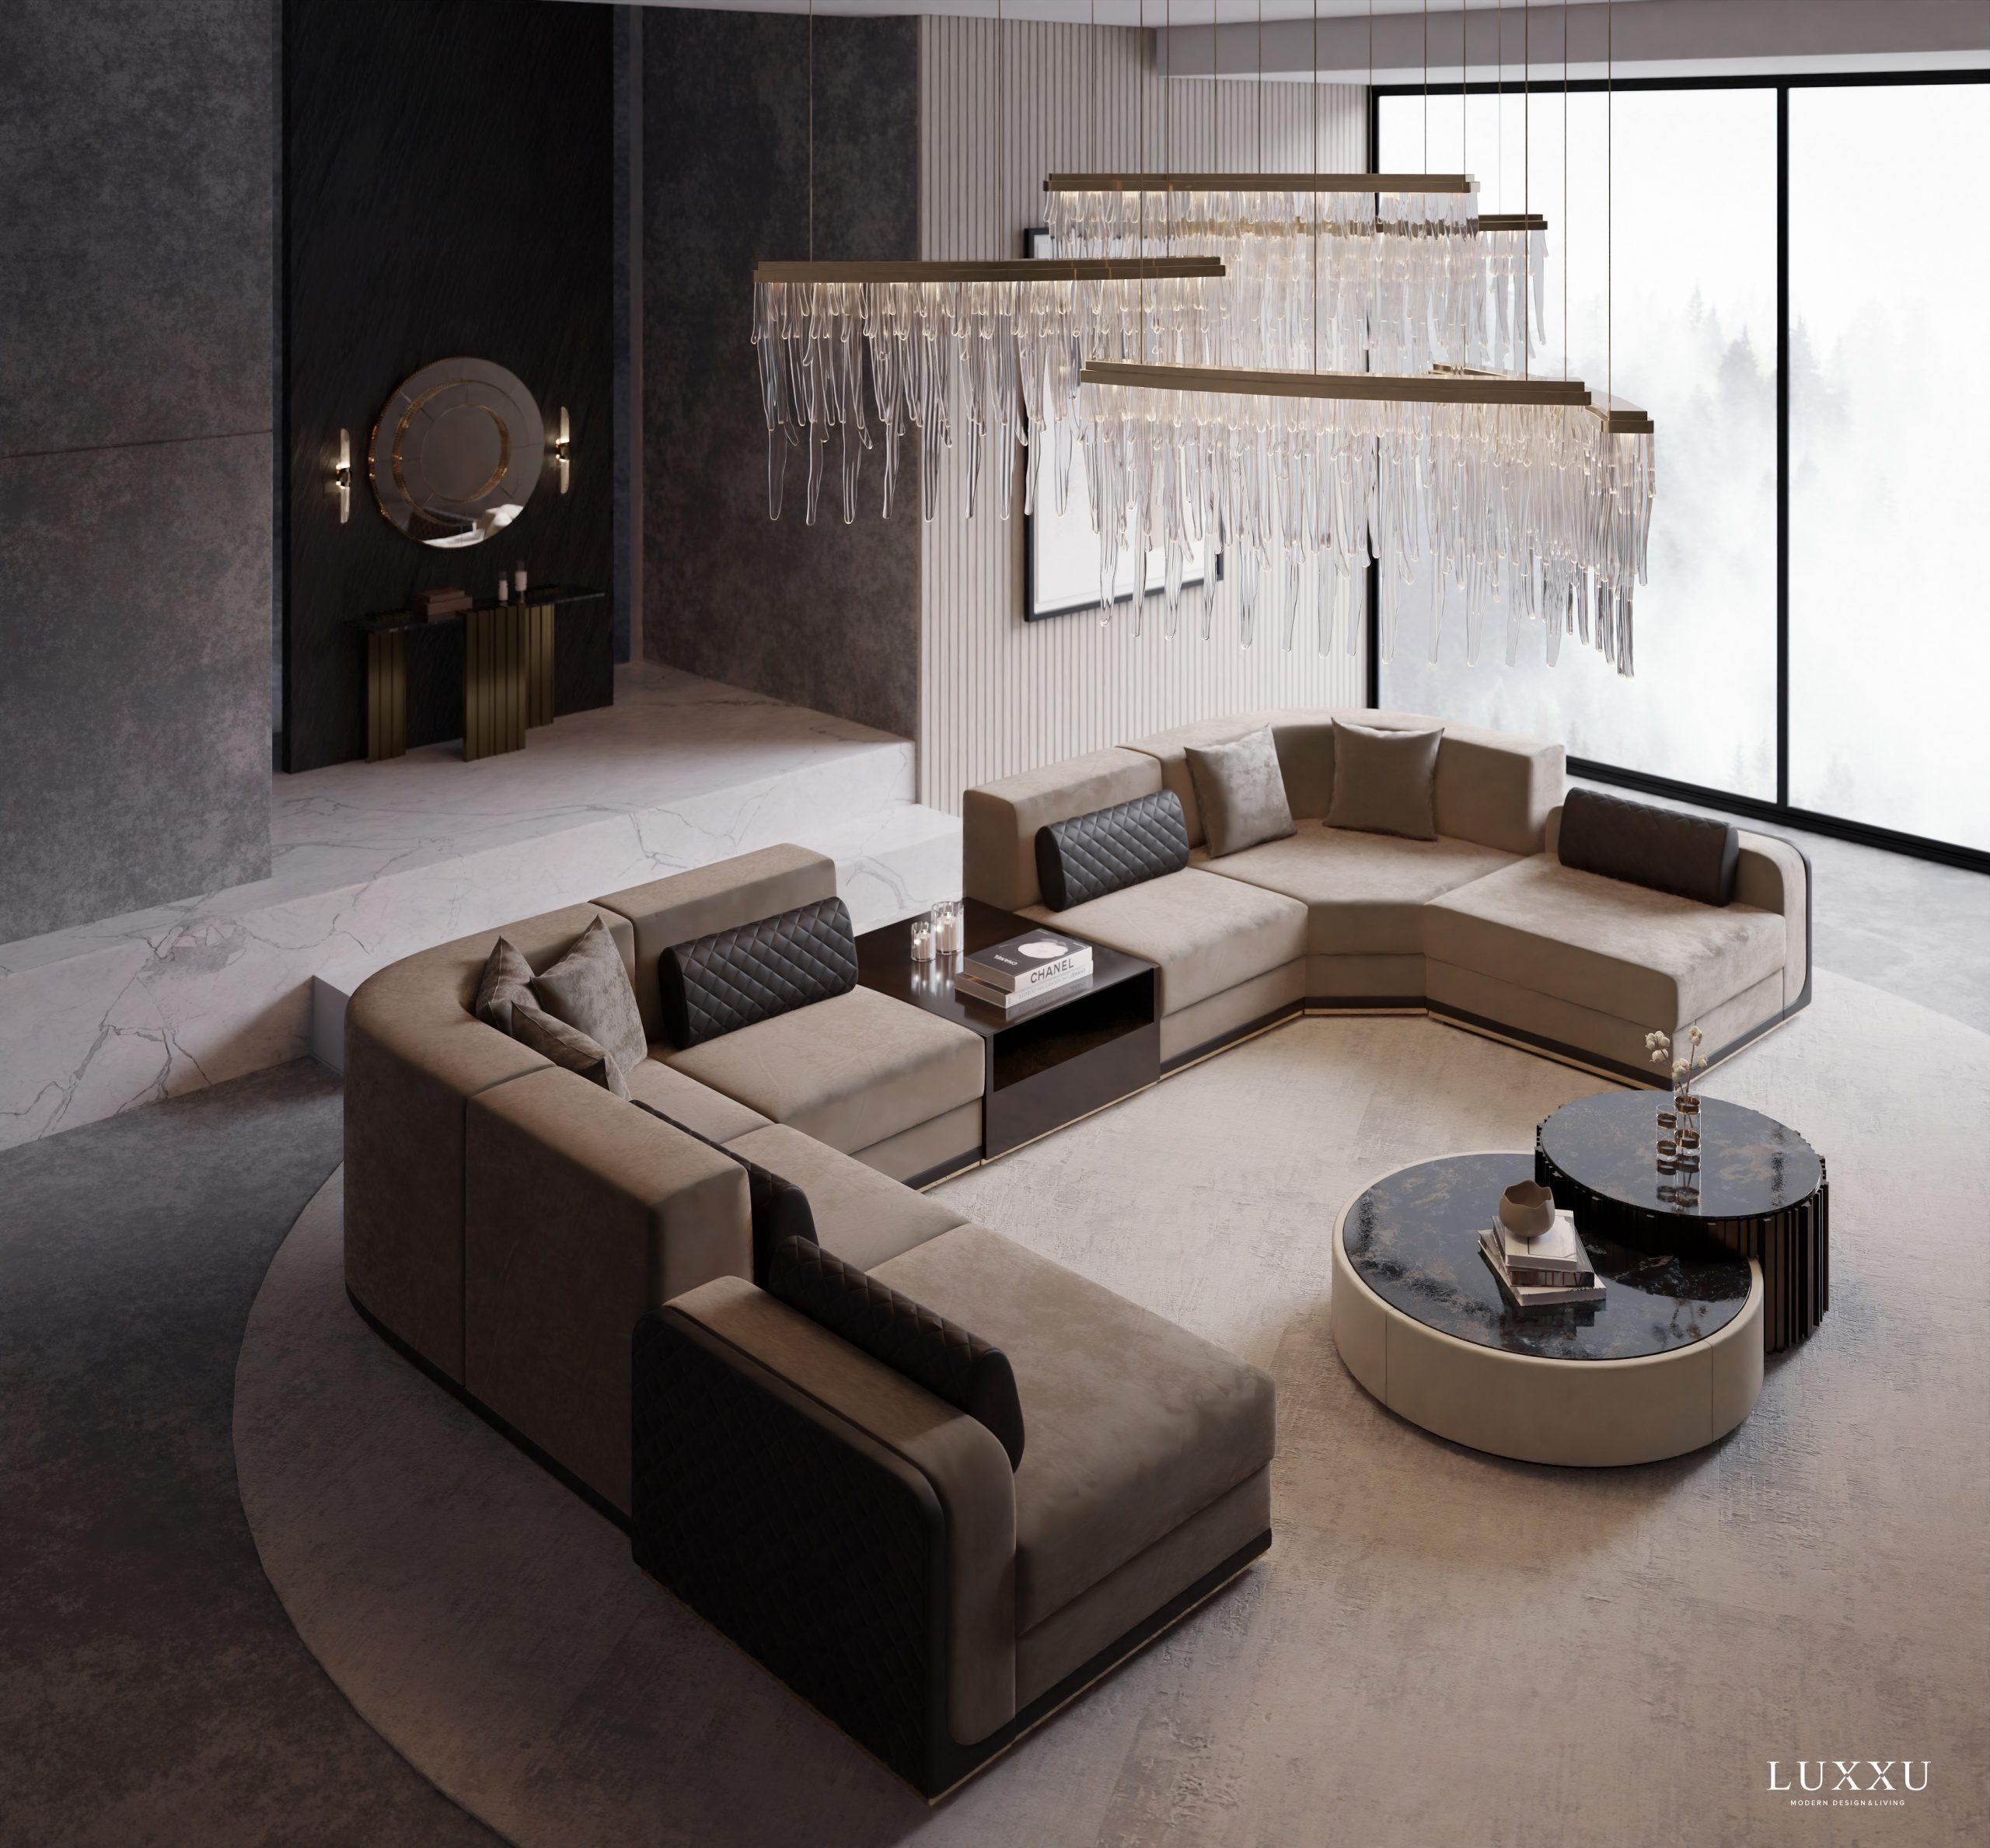 living room design Living Room Design – A Simple Yet Luxurious Setup Living Room Design A Simple Yet Luxurious Setup5